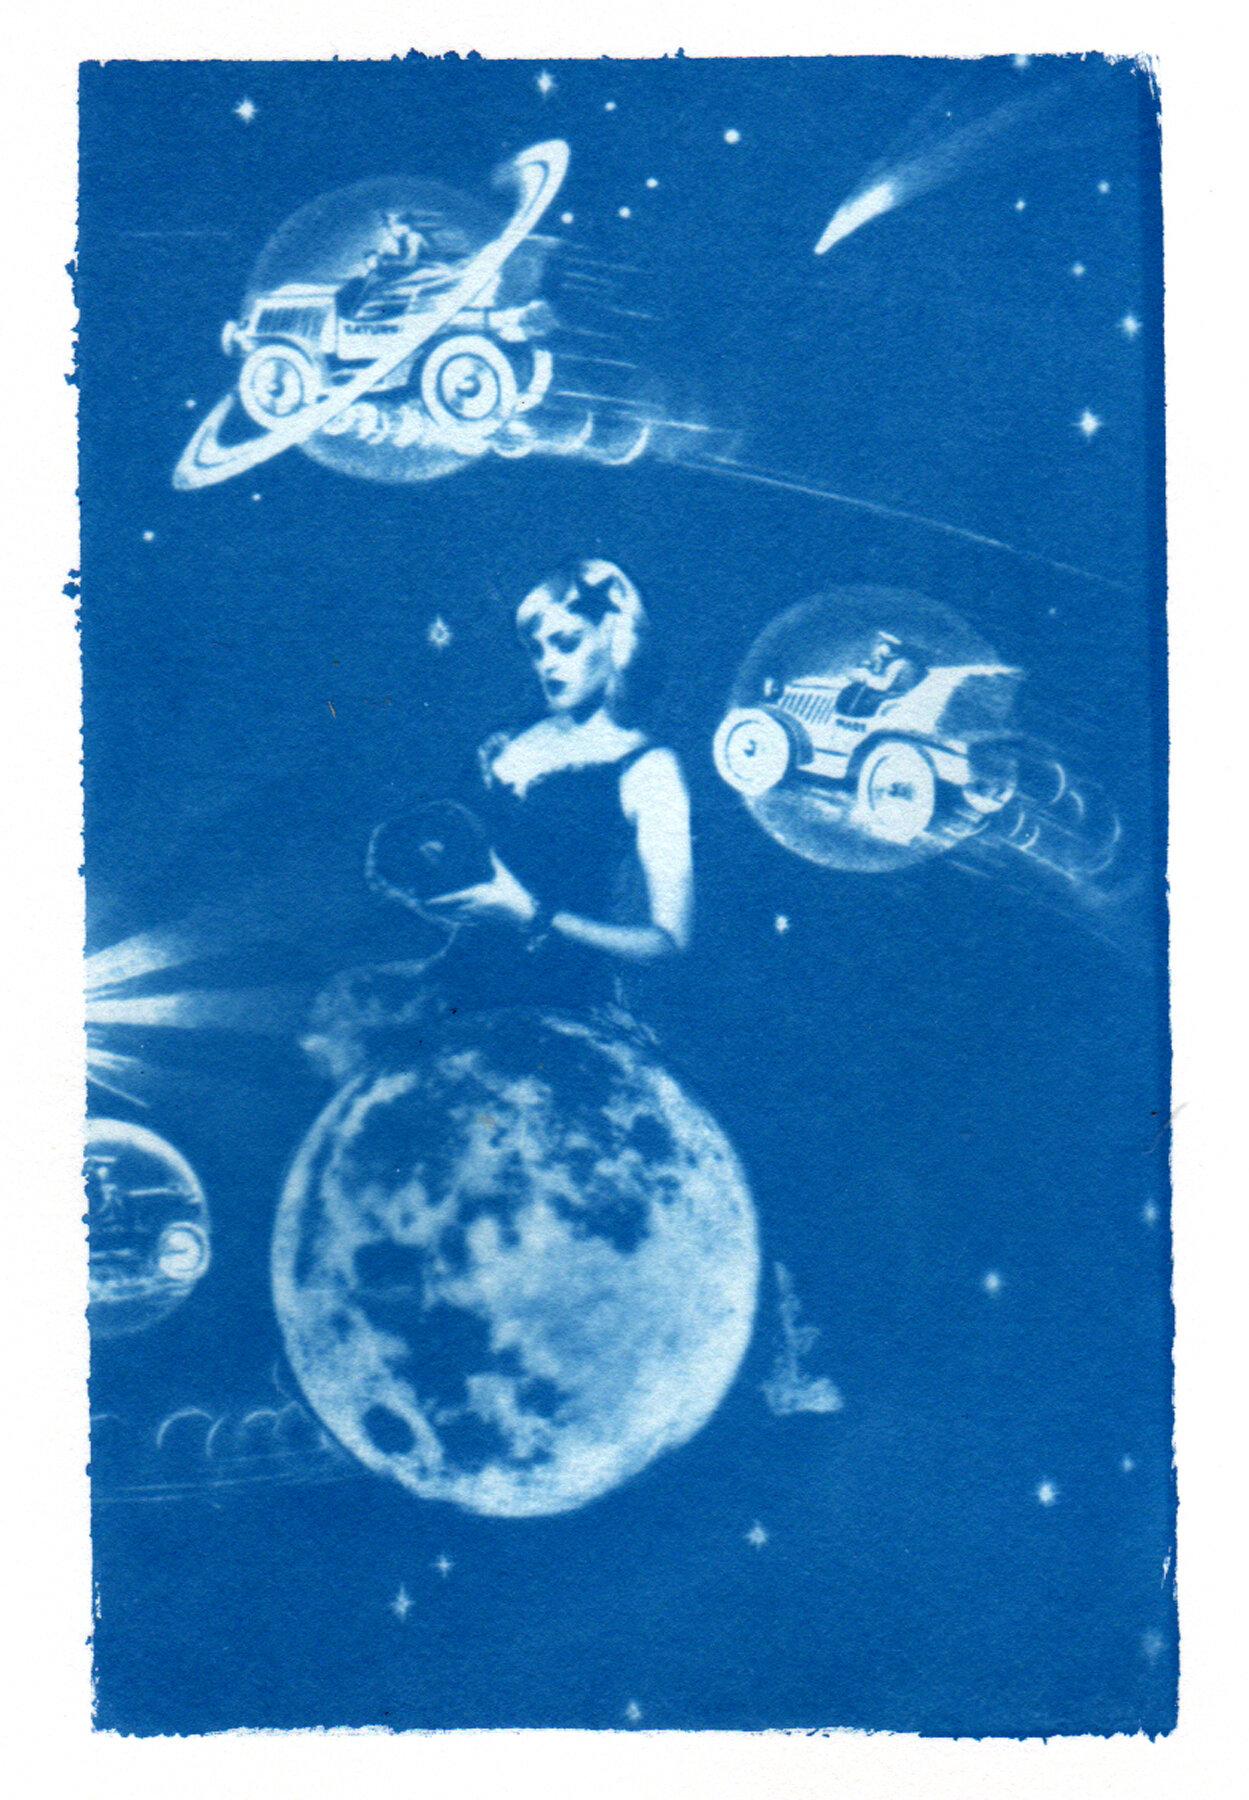 Amanda and her jukebox on the moon.  We Travel the Spaceways, cyanotype 2011.